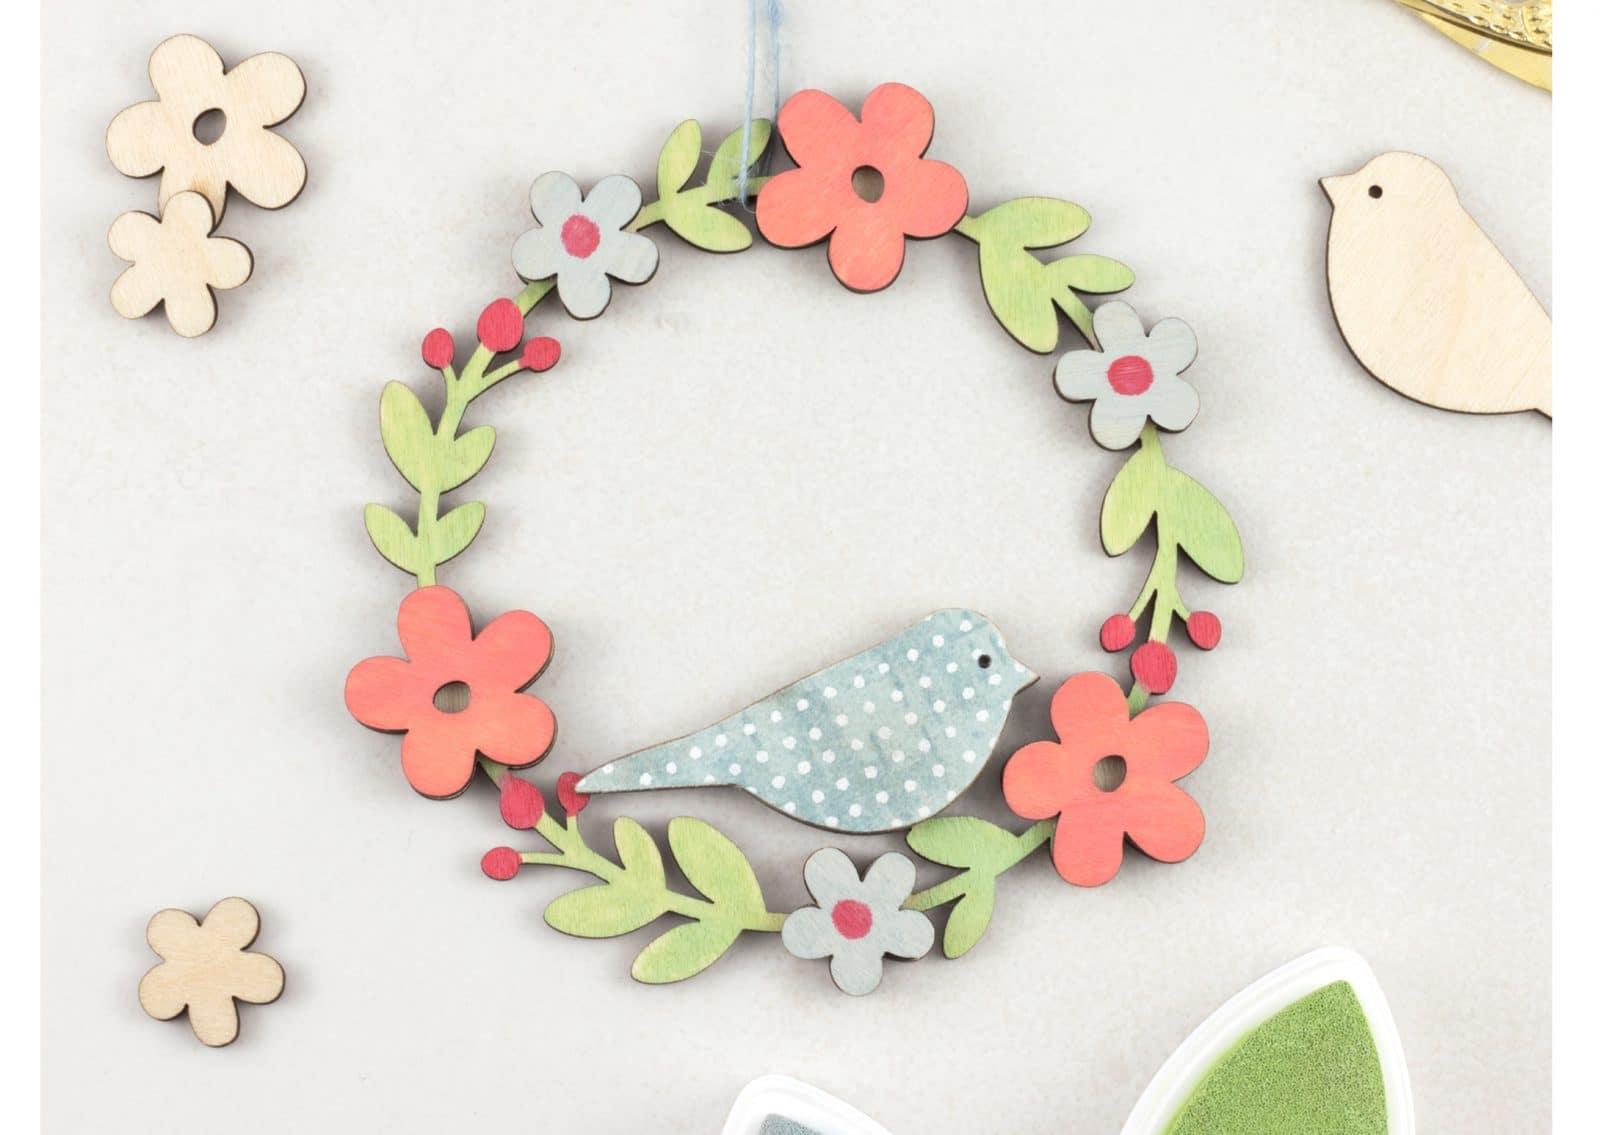 Grand Make Handmade Fair 2017 Wooden Wreath